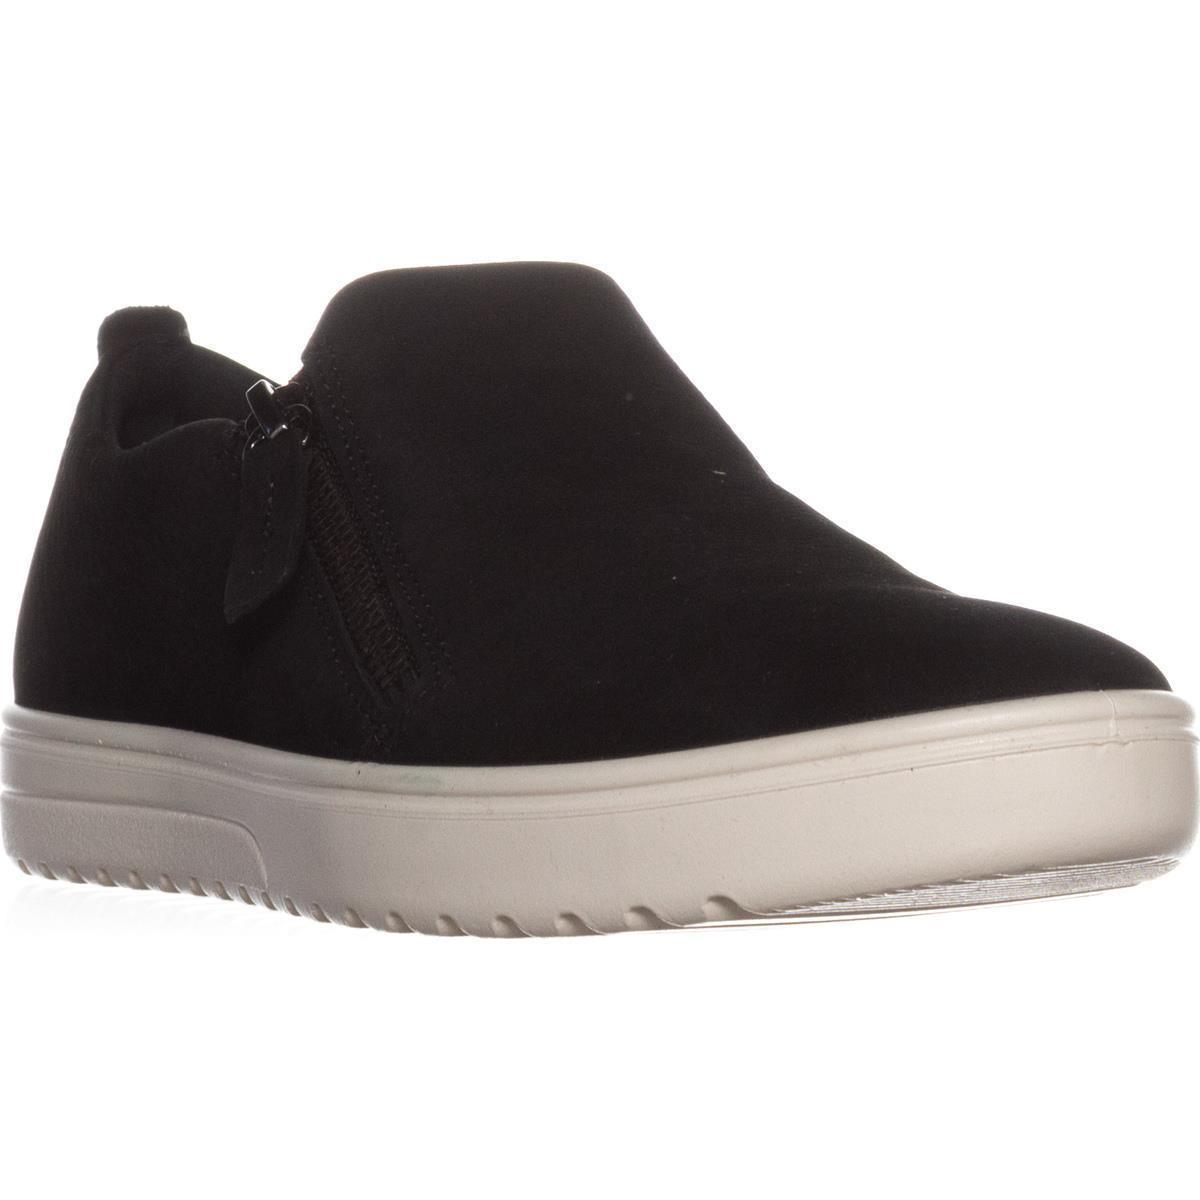 Womens ECCO Footwear Fara Slip-On Loafers, Black Black by Ecco